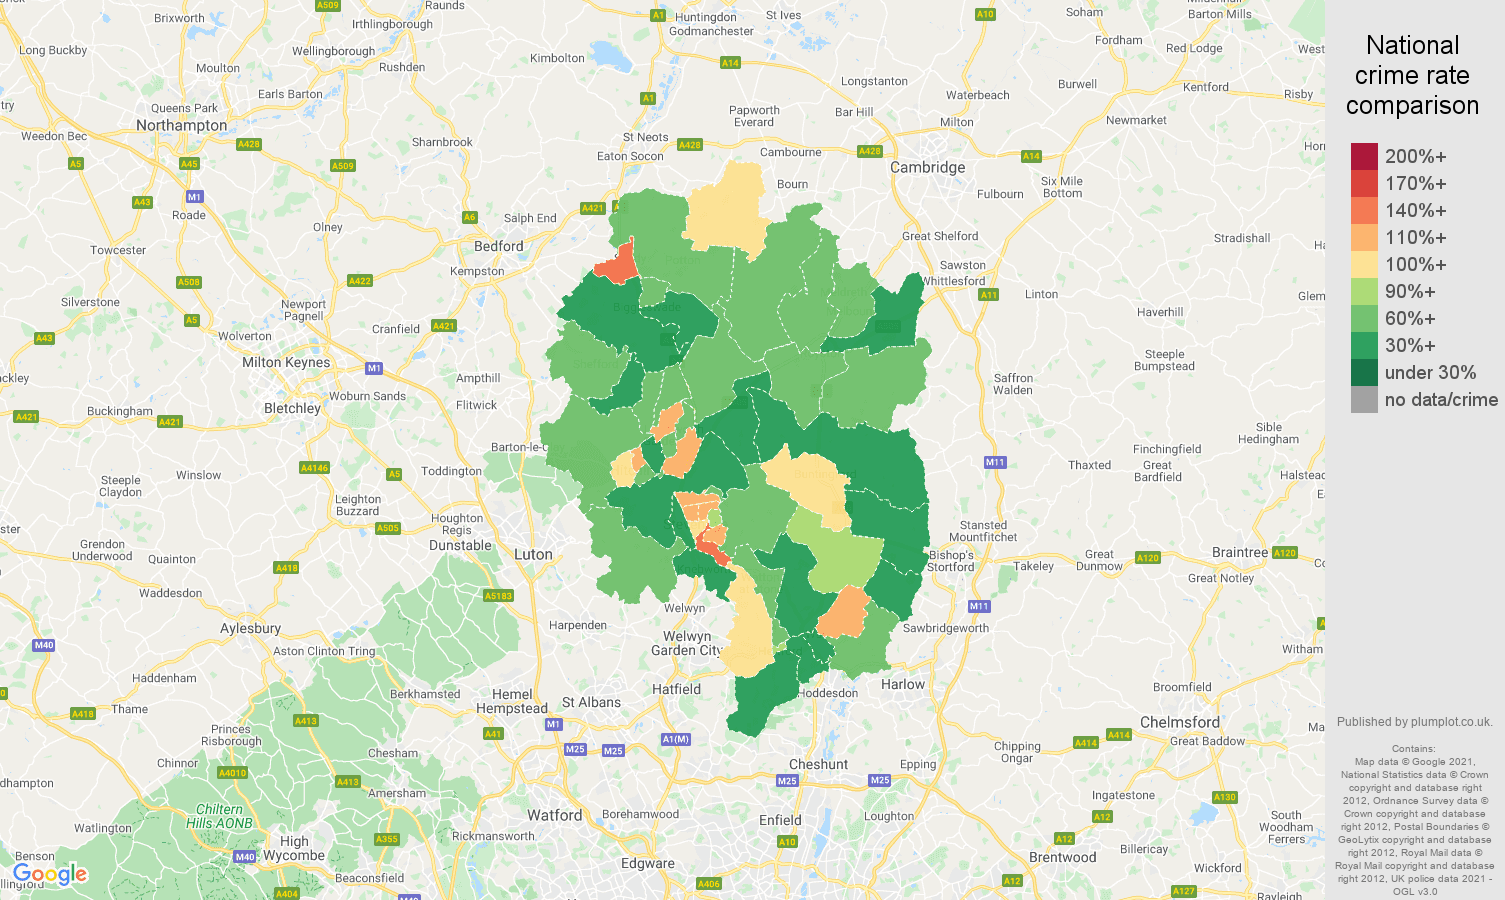 Stevenage criminal damage and arson crime rate comparison map